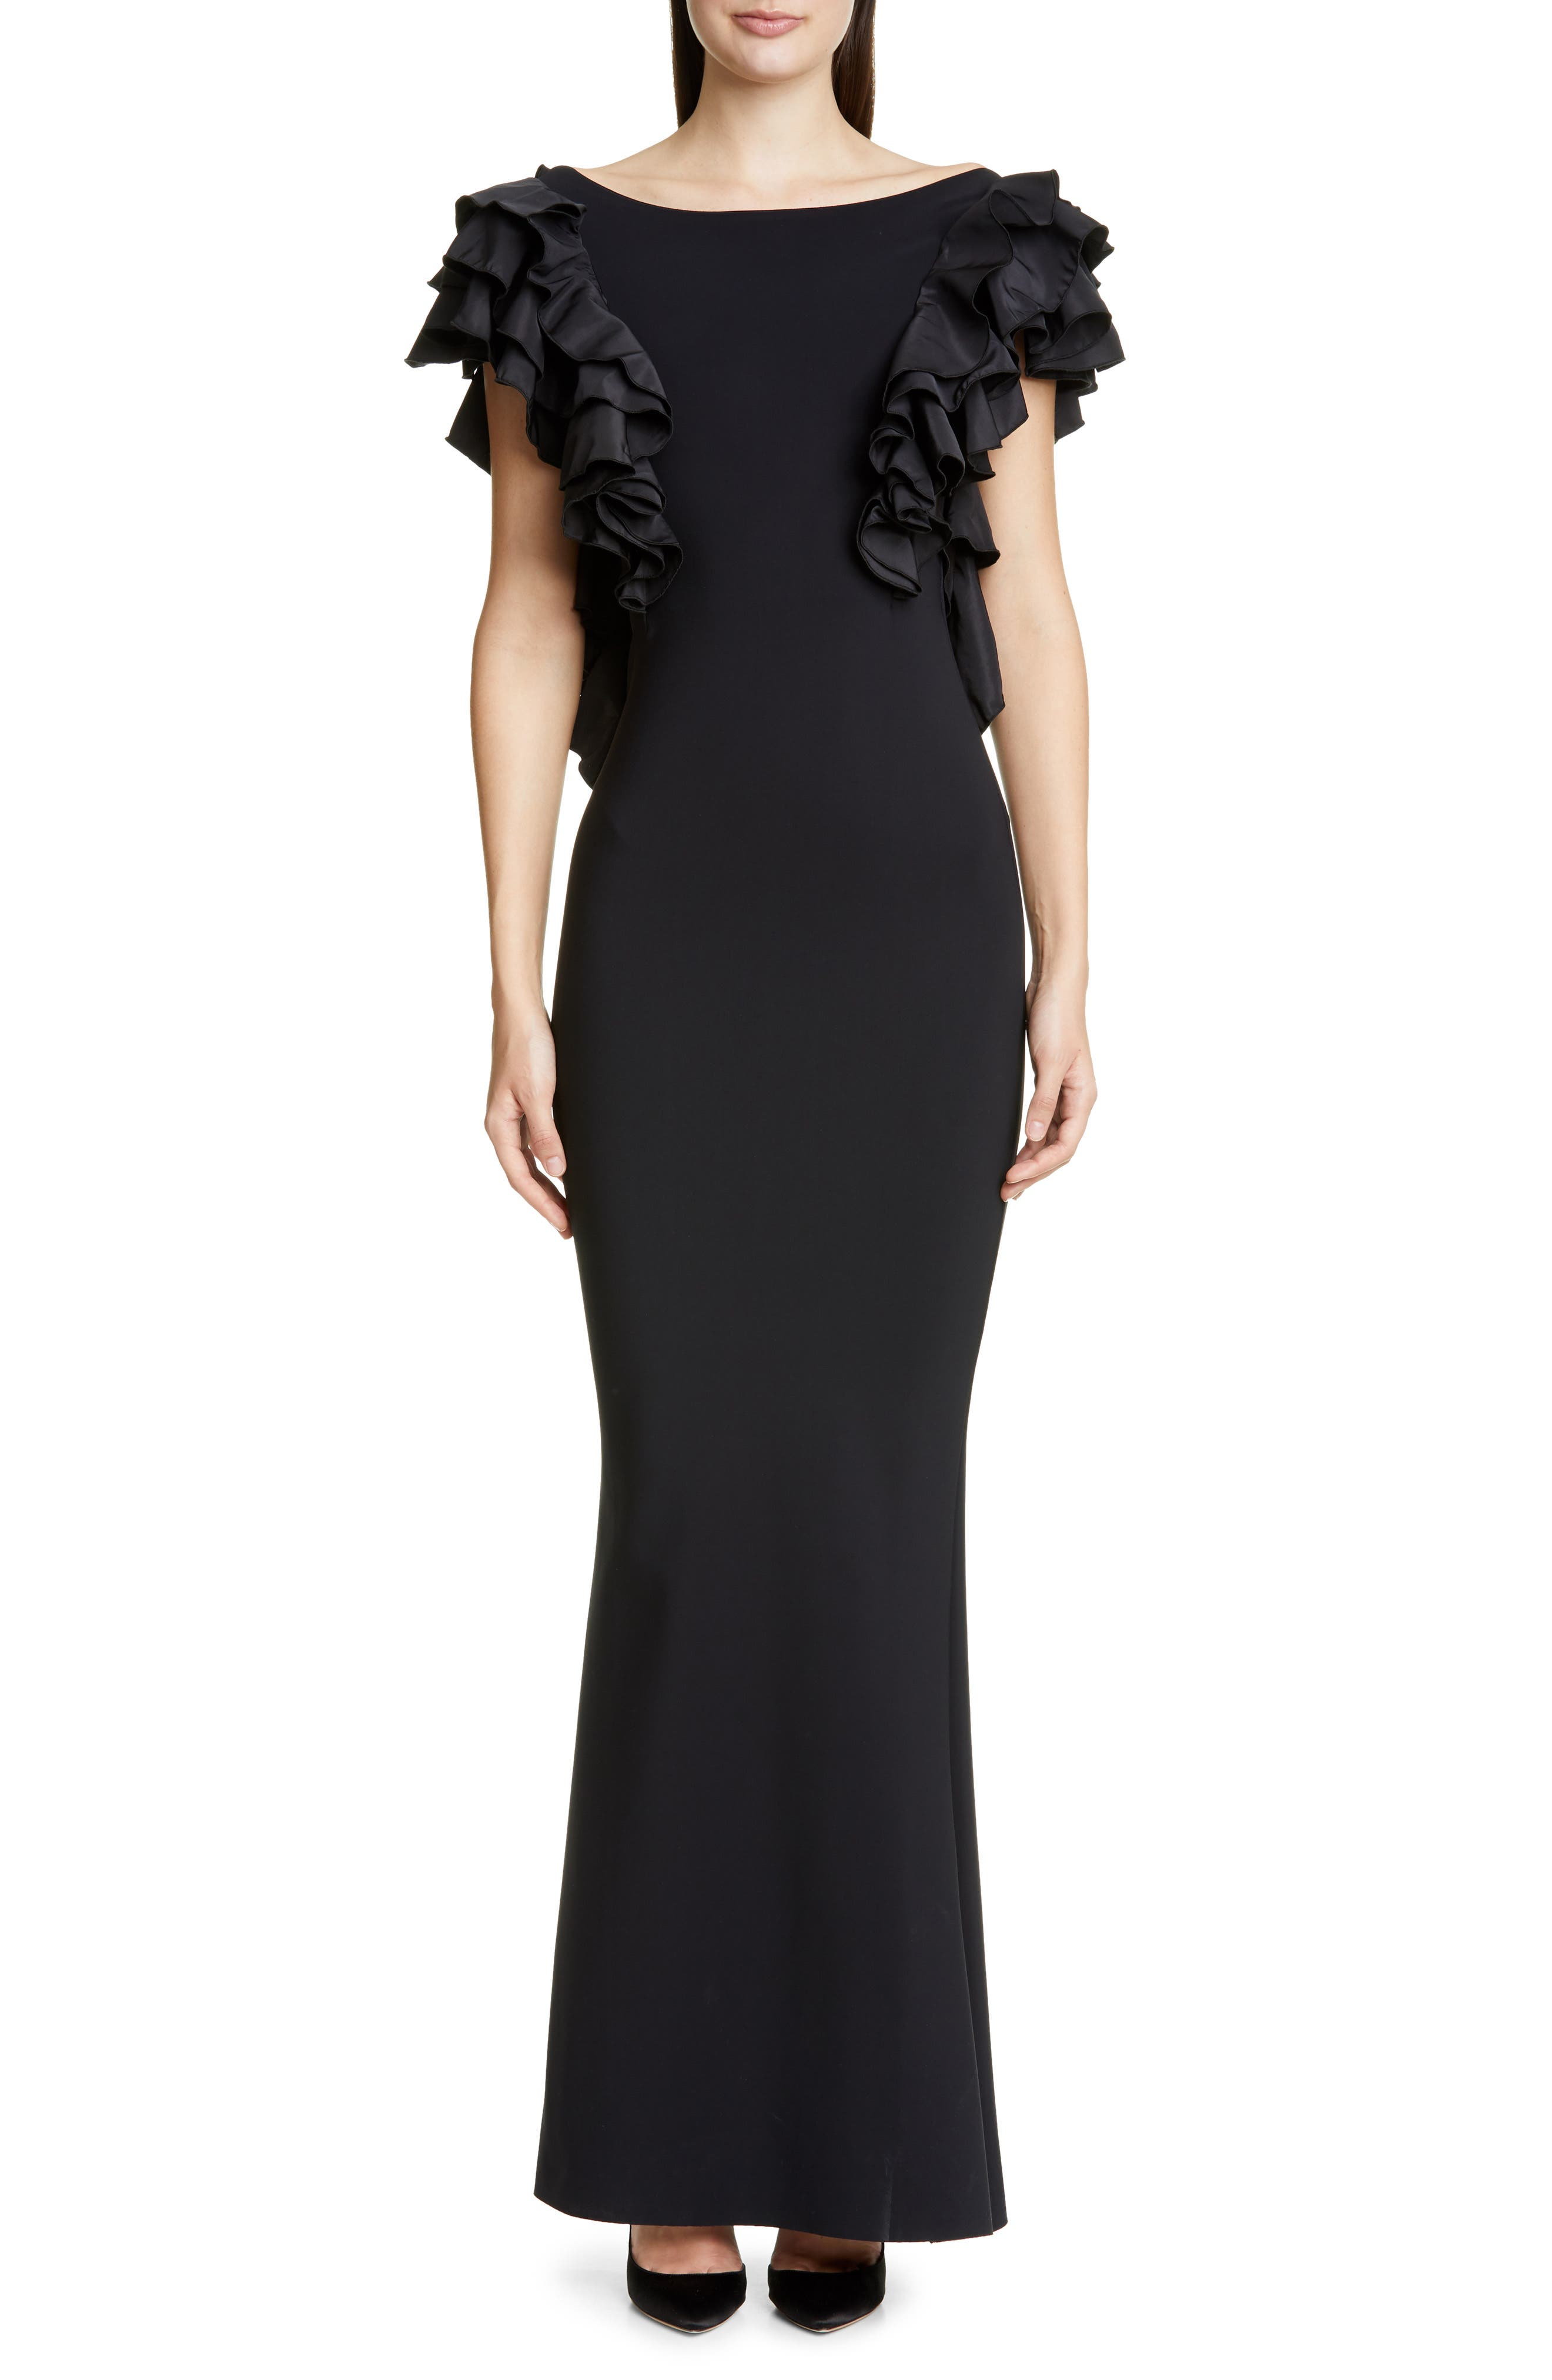 Chiara Boni La Petite Robe Orchidea Ruffle Sleeve Evening Gown, 8 IT - Black